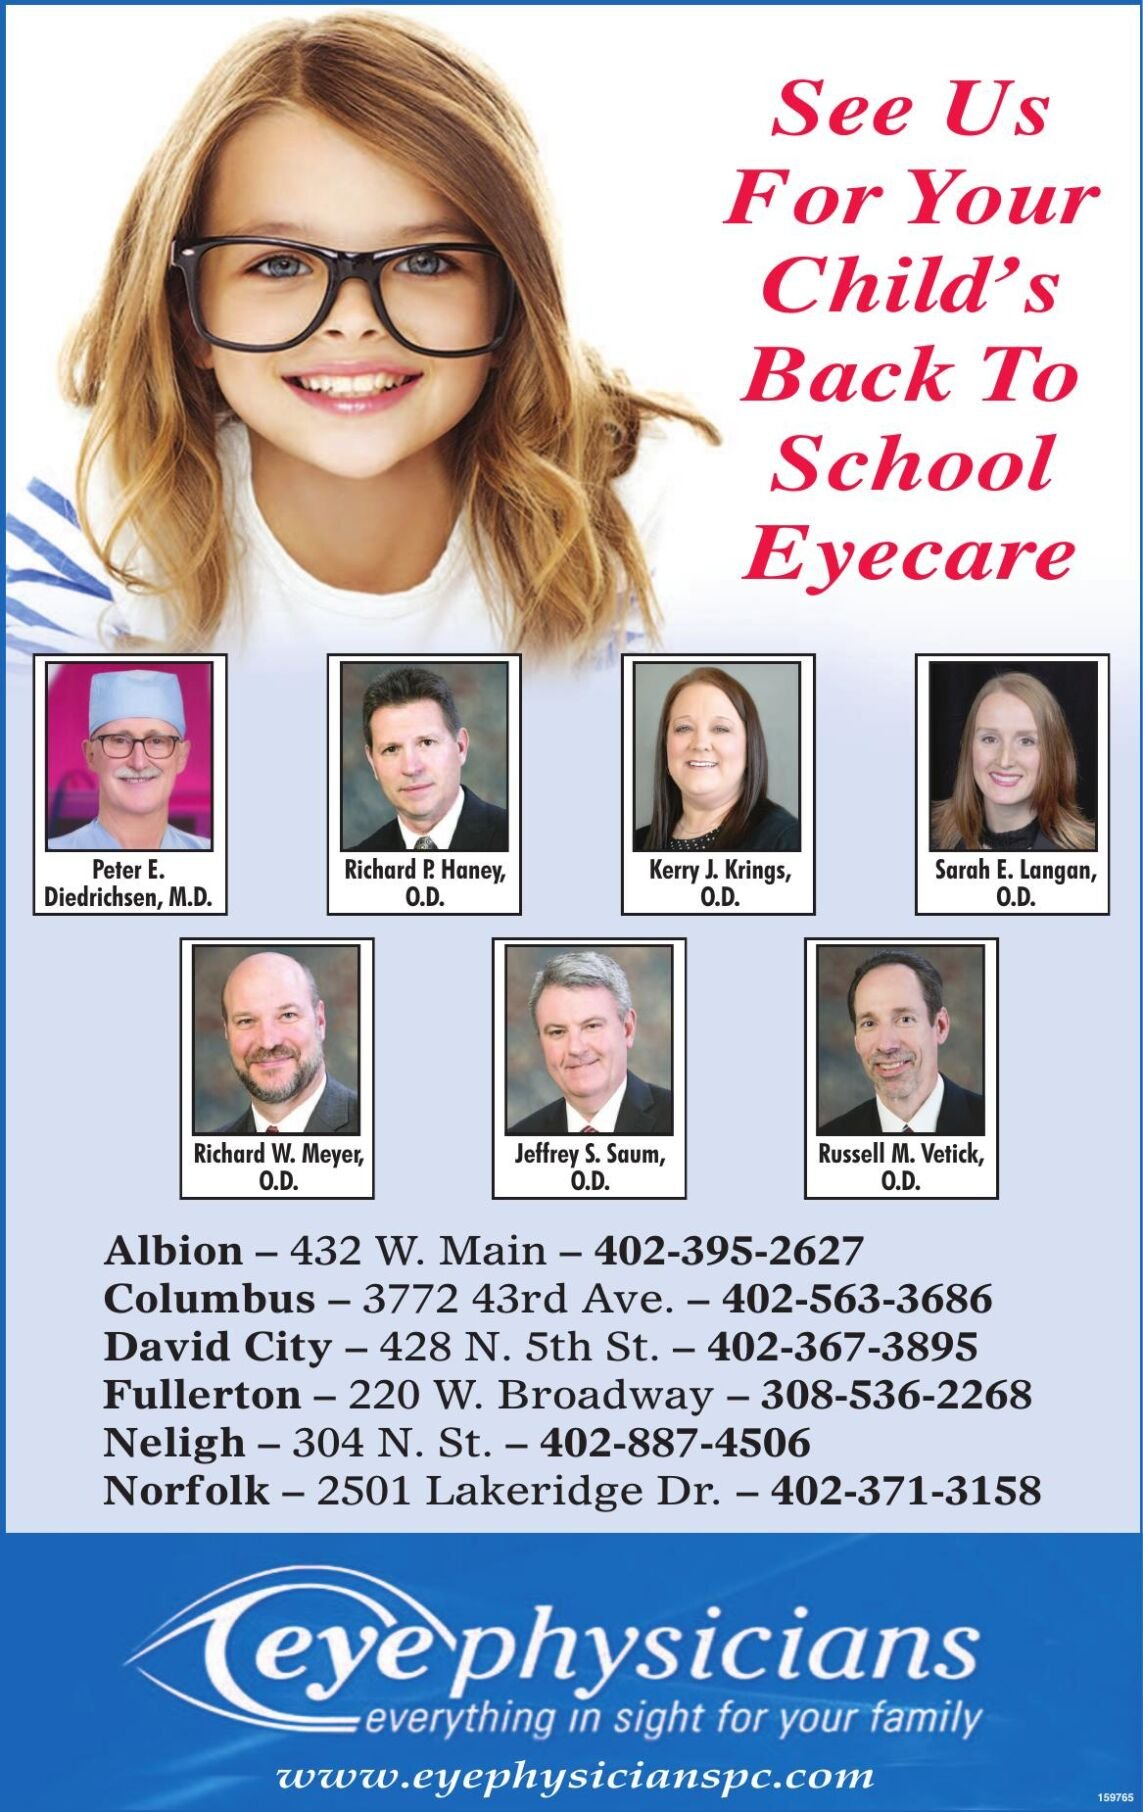 Eye Physicians